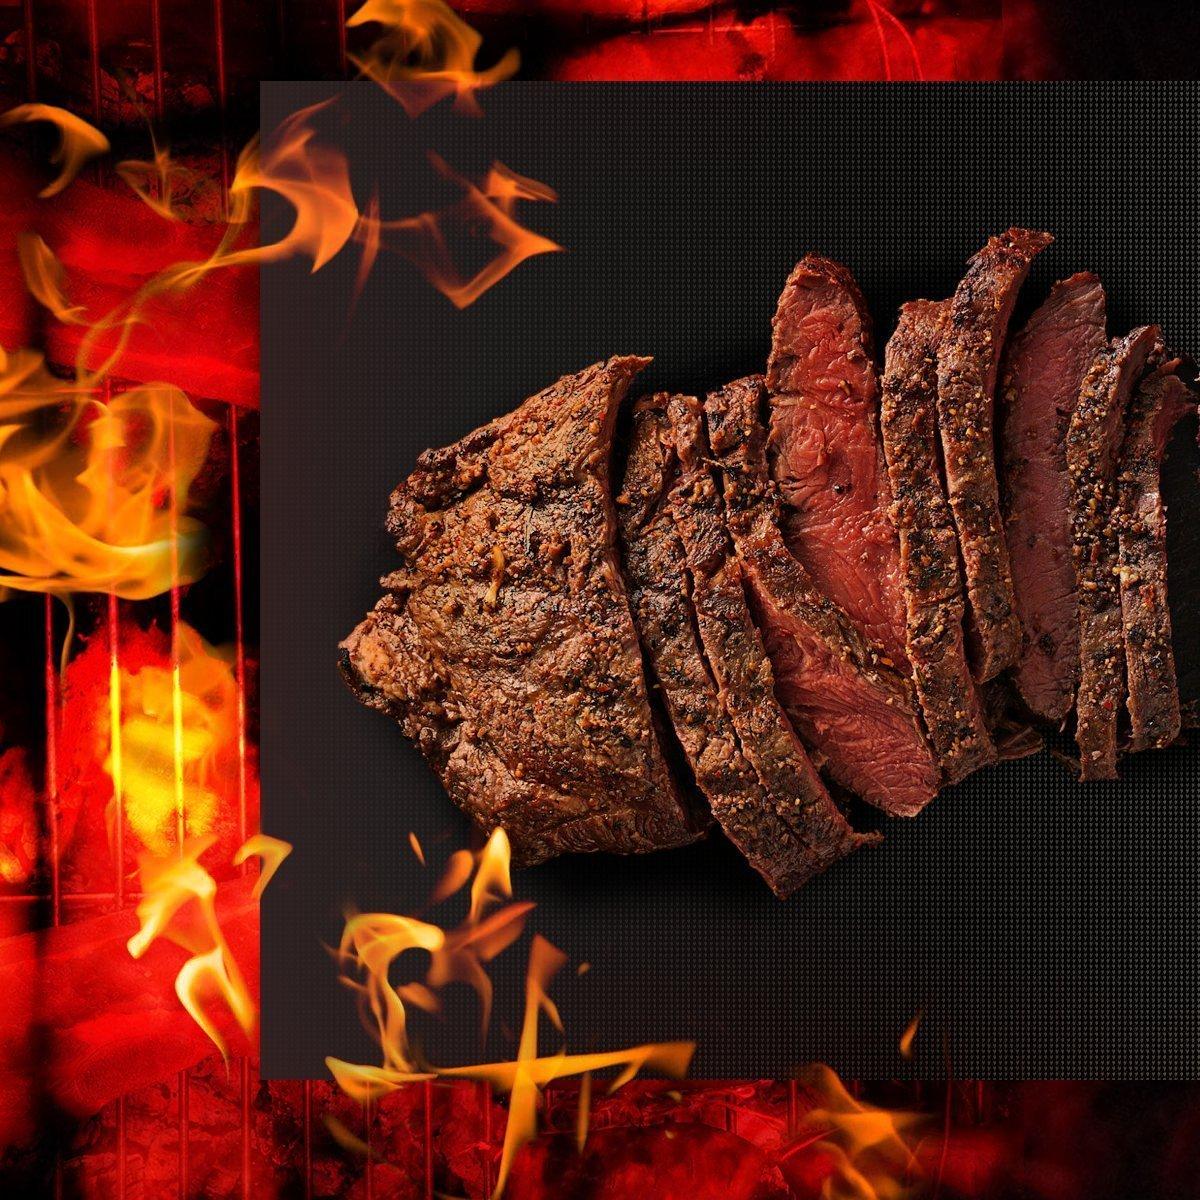 Juego de 6 placas para barbacoa, de horno, teflón antiadherente, cocina – reutilizable, resistente, resistente al calor, fácil de limpiar, placas ...